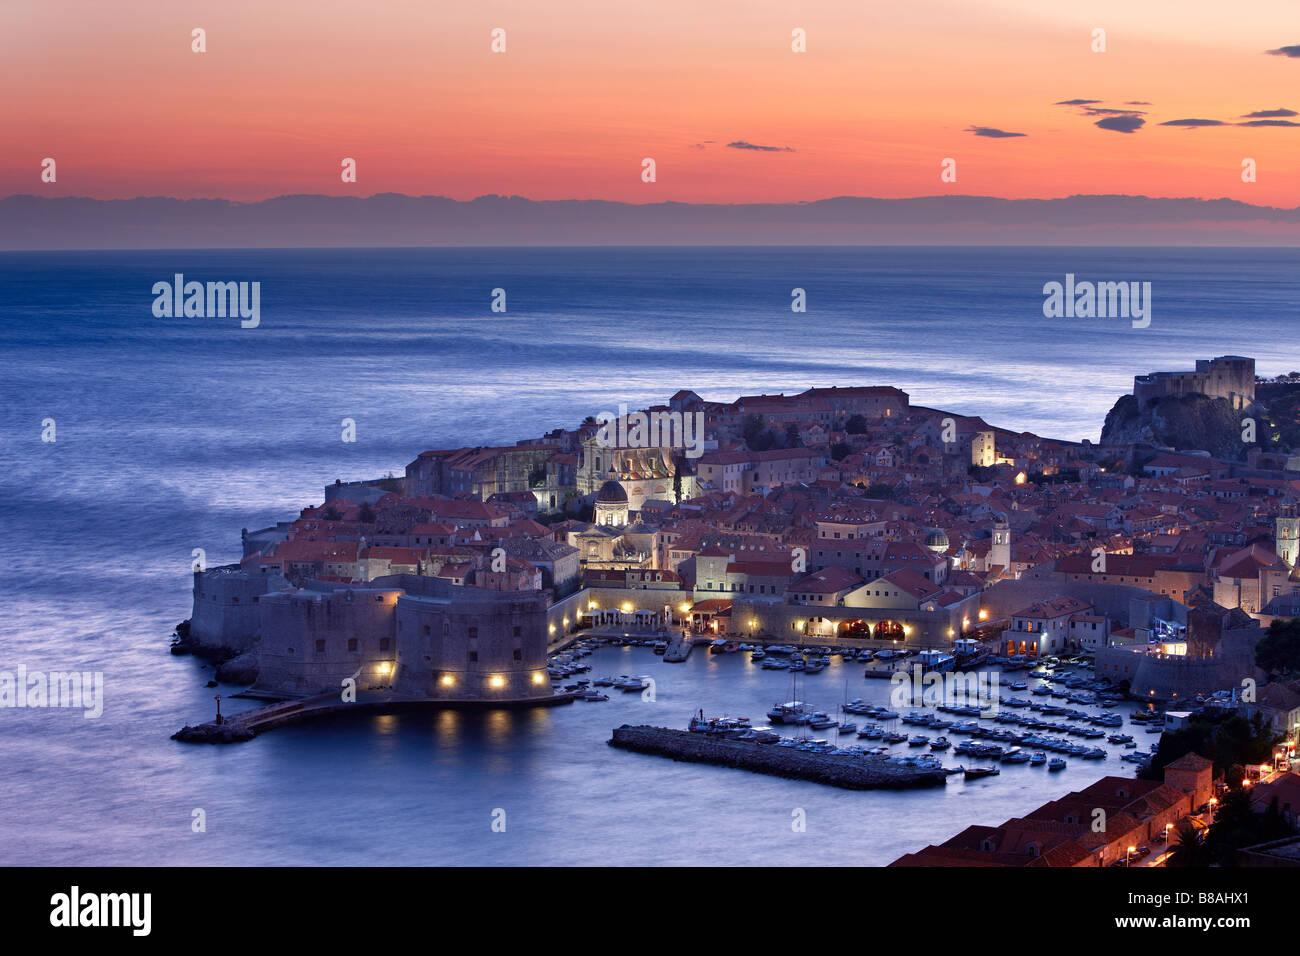 old town harbour dusk Dubrovnik Dalmatia Croatia - Stock Image